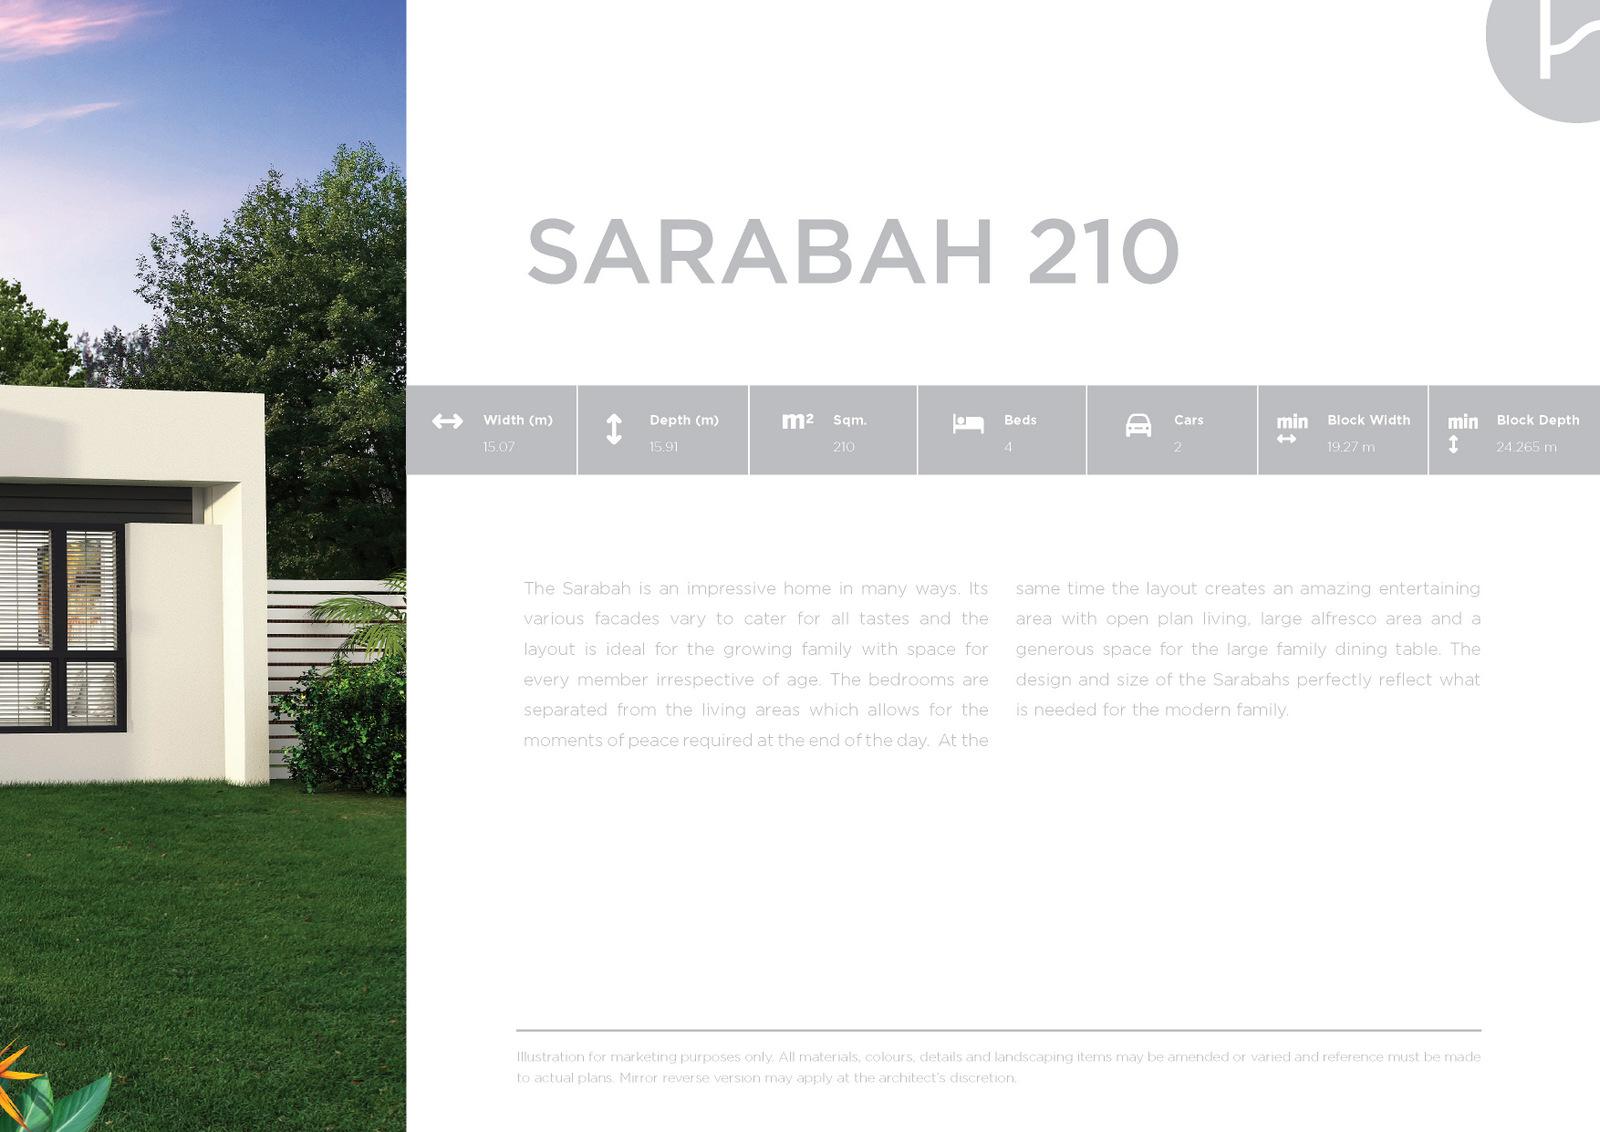 The Sarabah 210